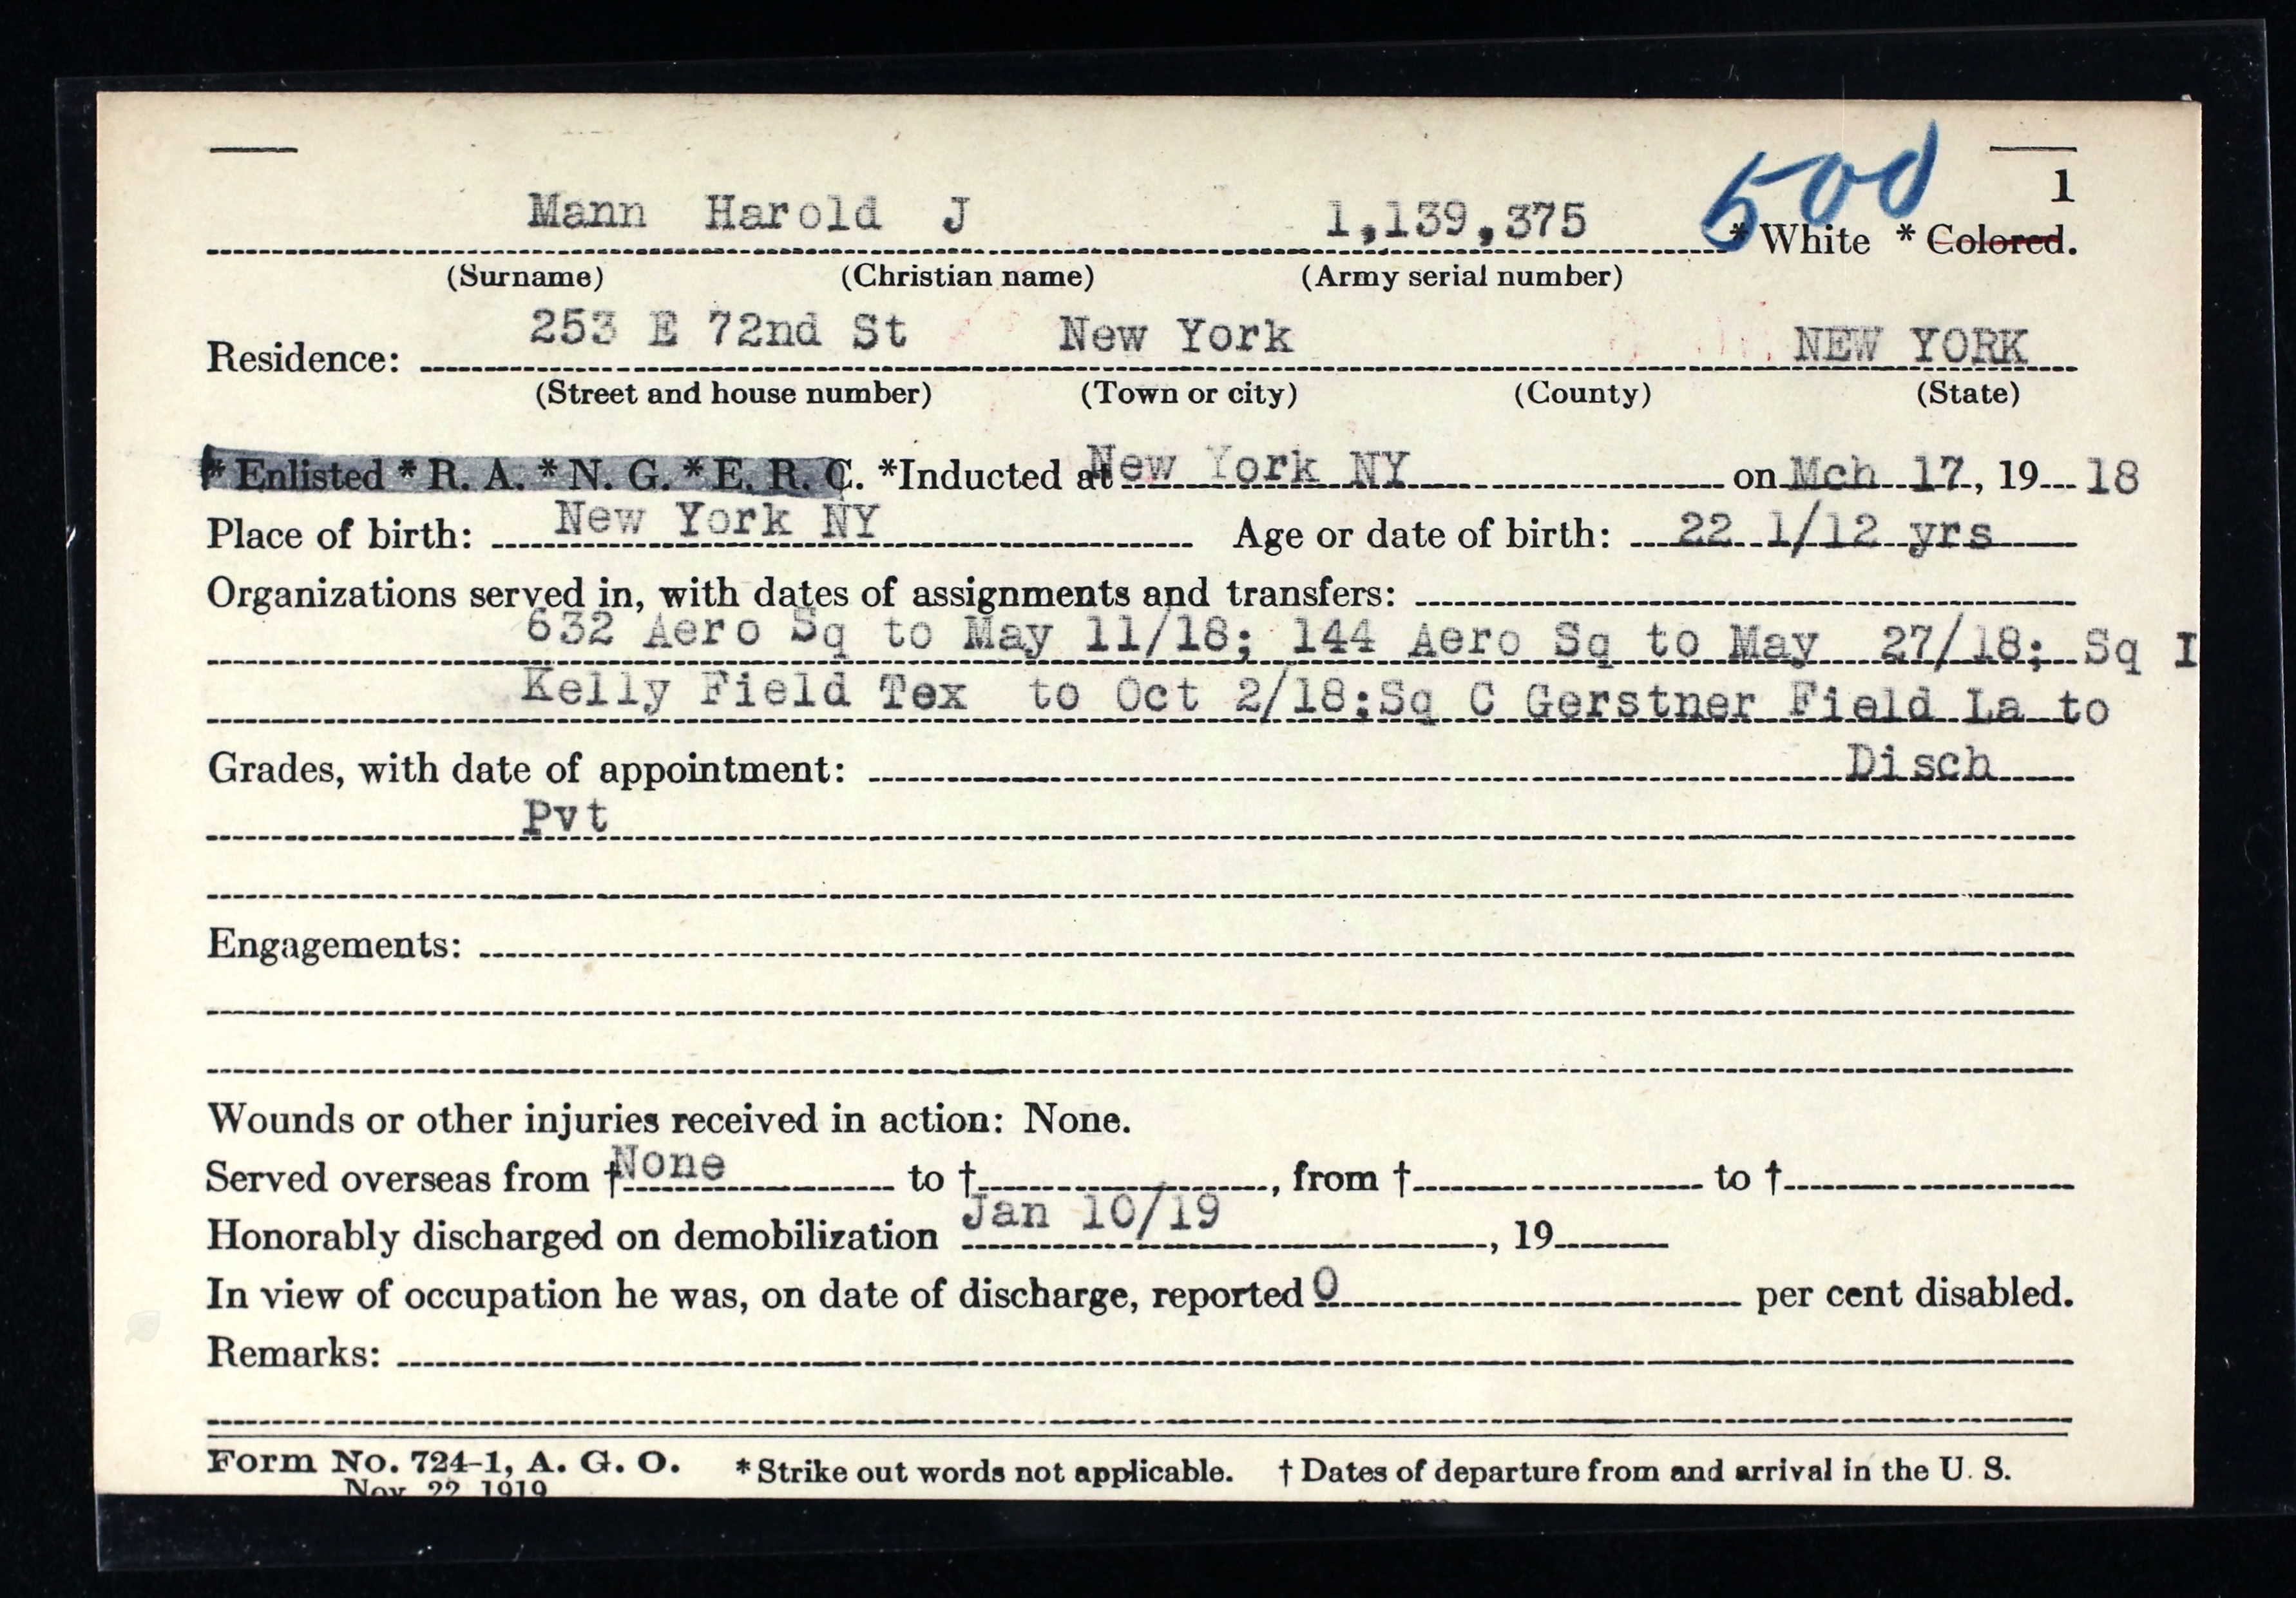 File Harold J Mann Brooks Benedict Honorable Discharge